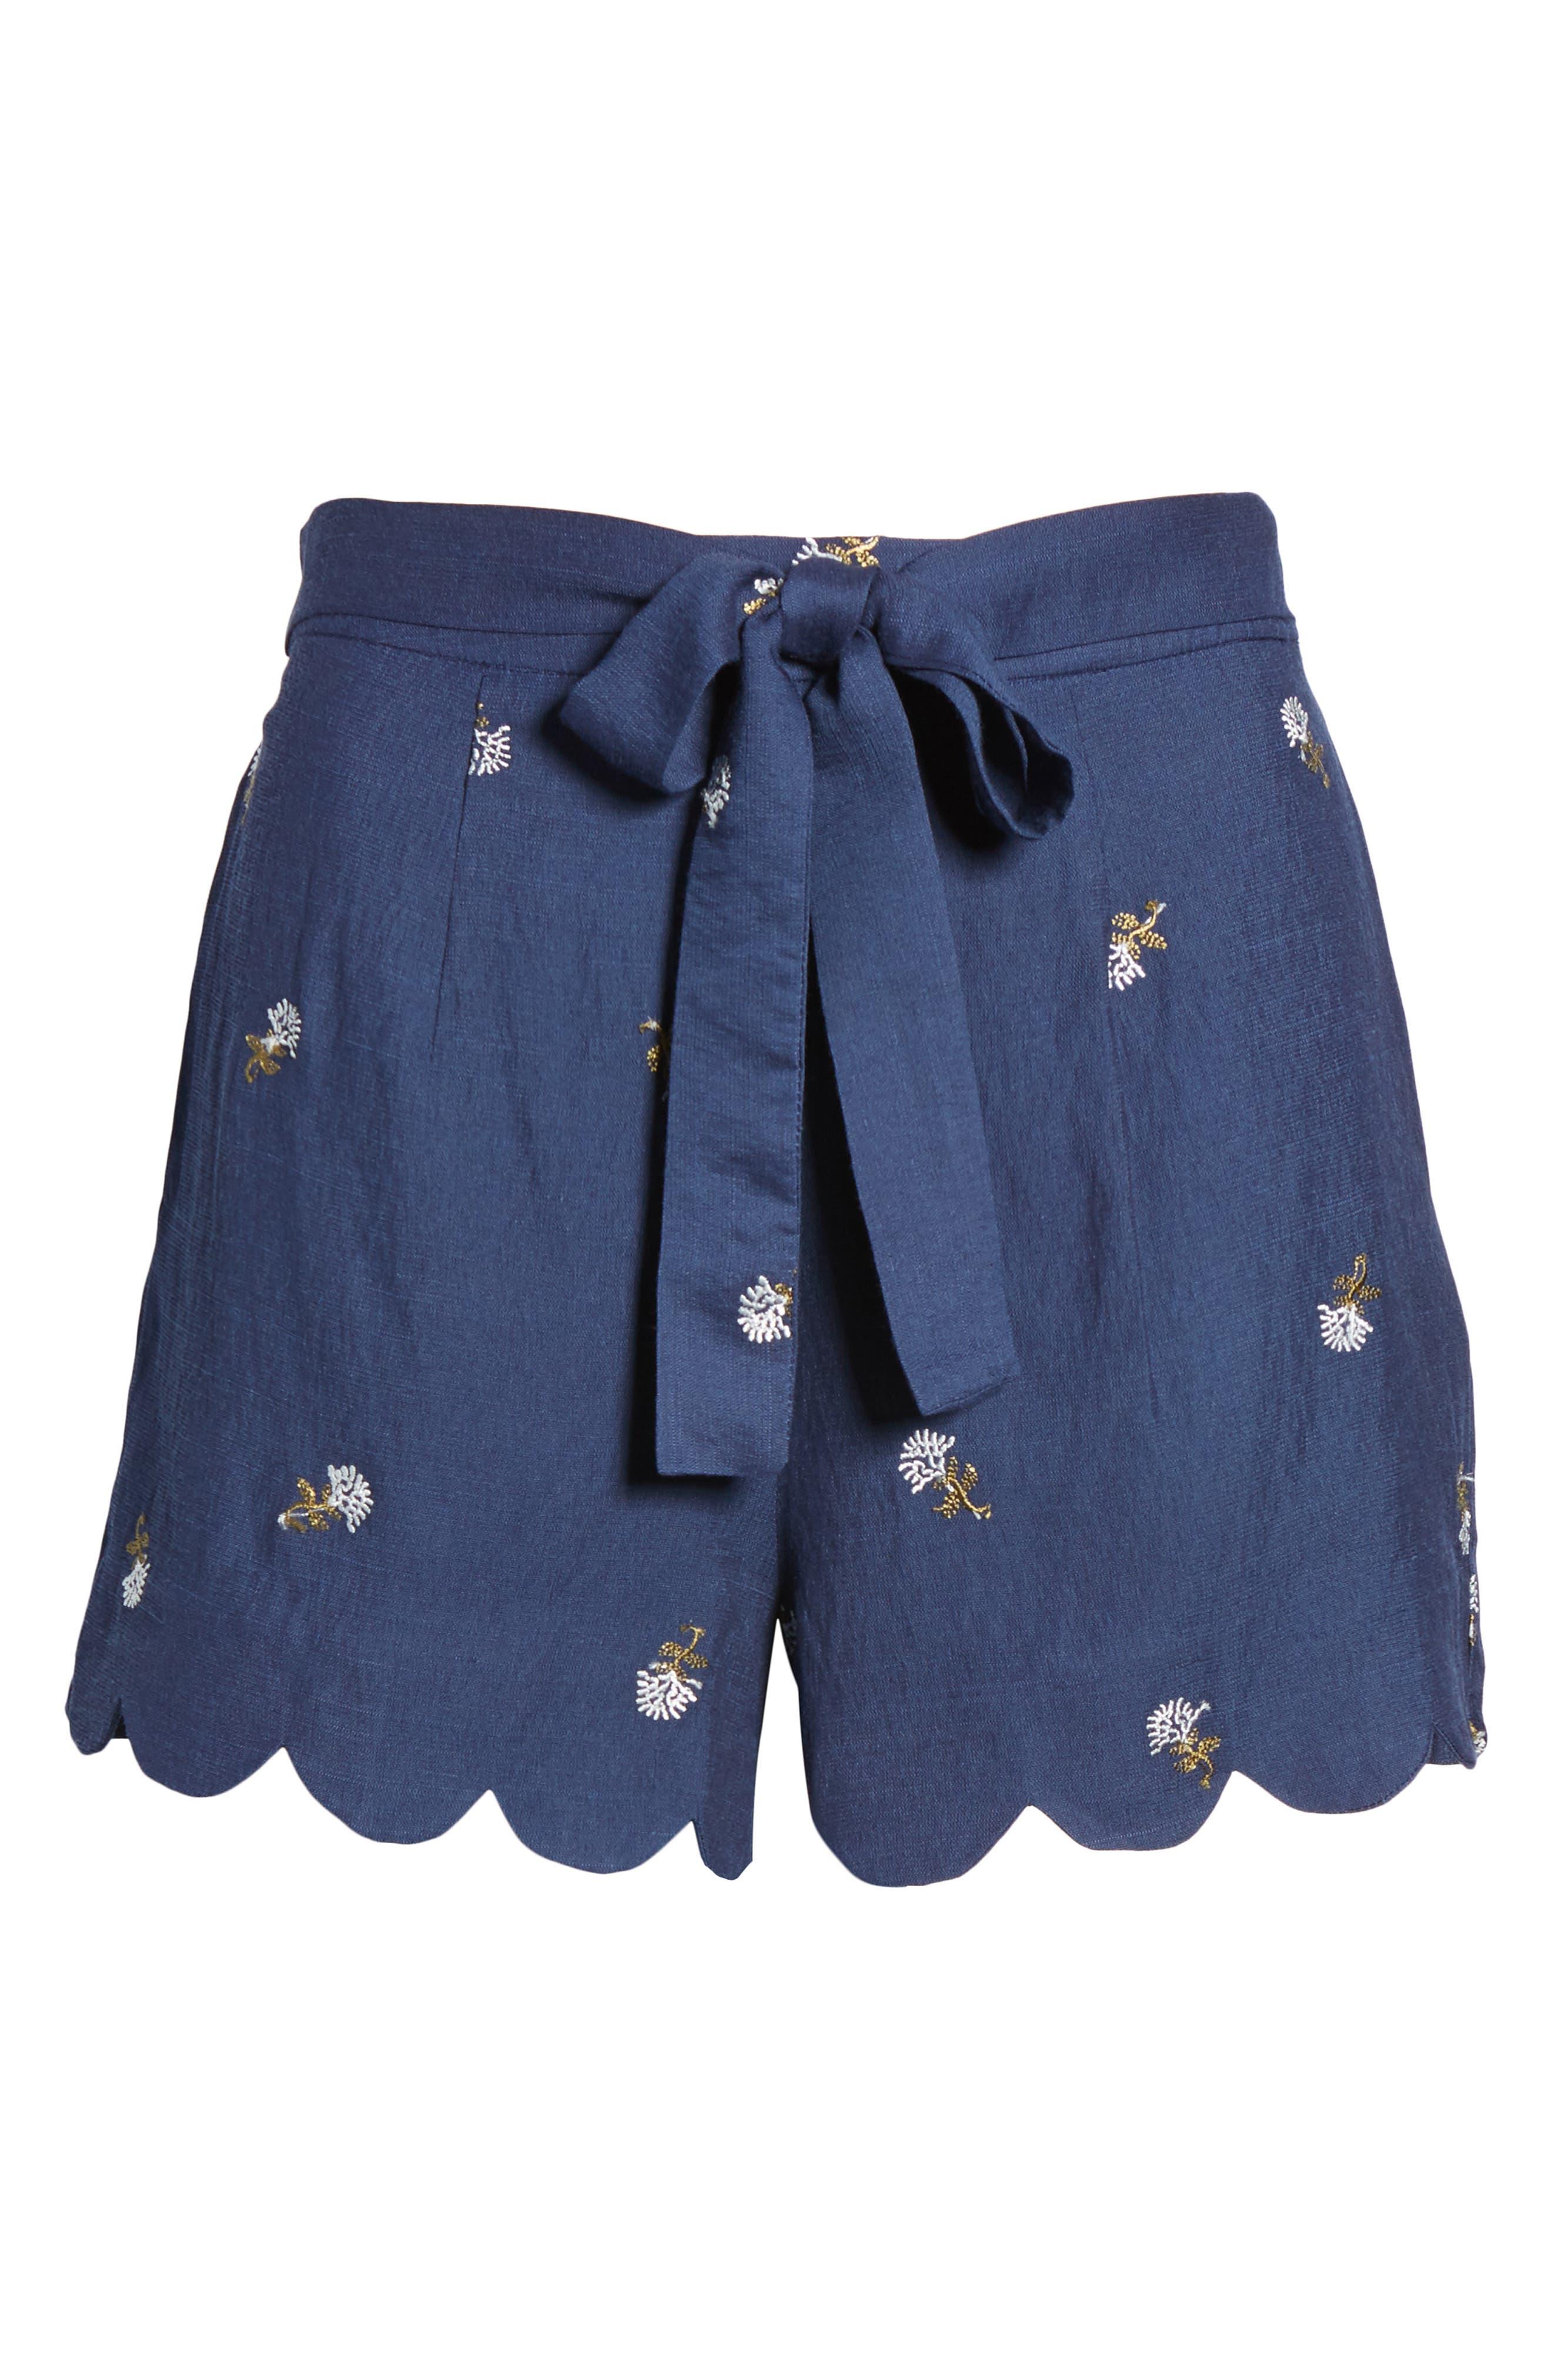 High Waist Scallop Hem Shorts,                             Alternate thumbnail 6, color,                             400